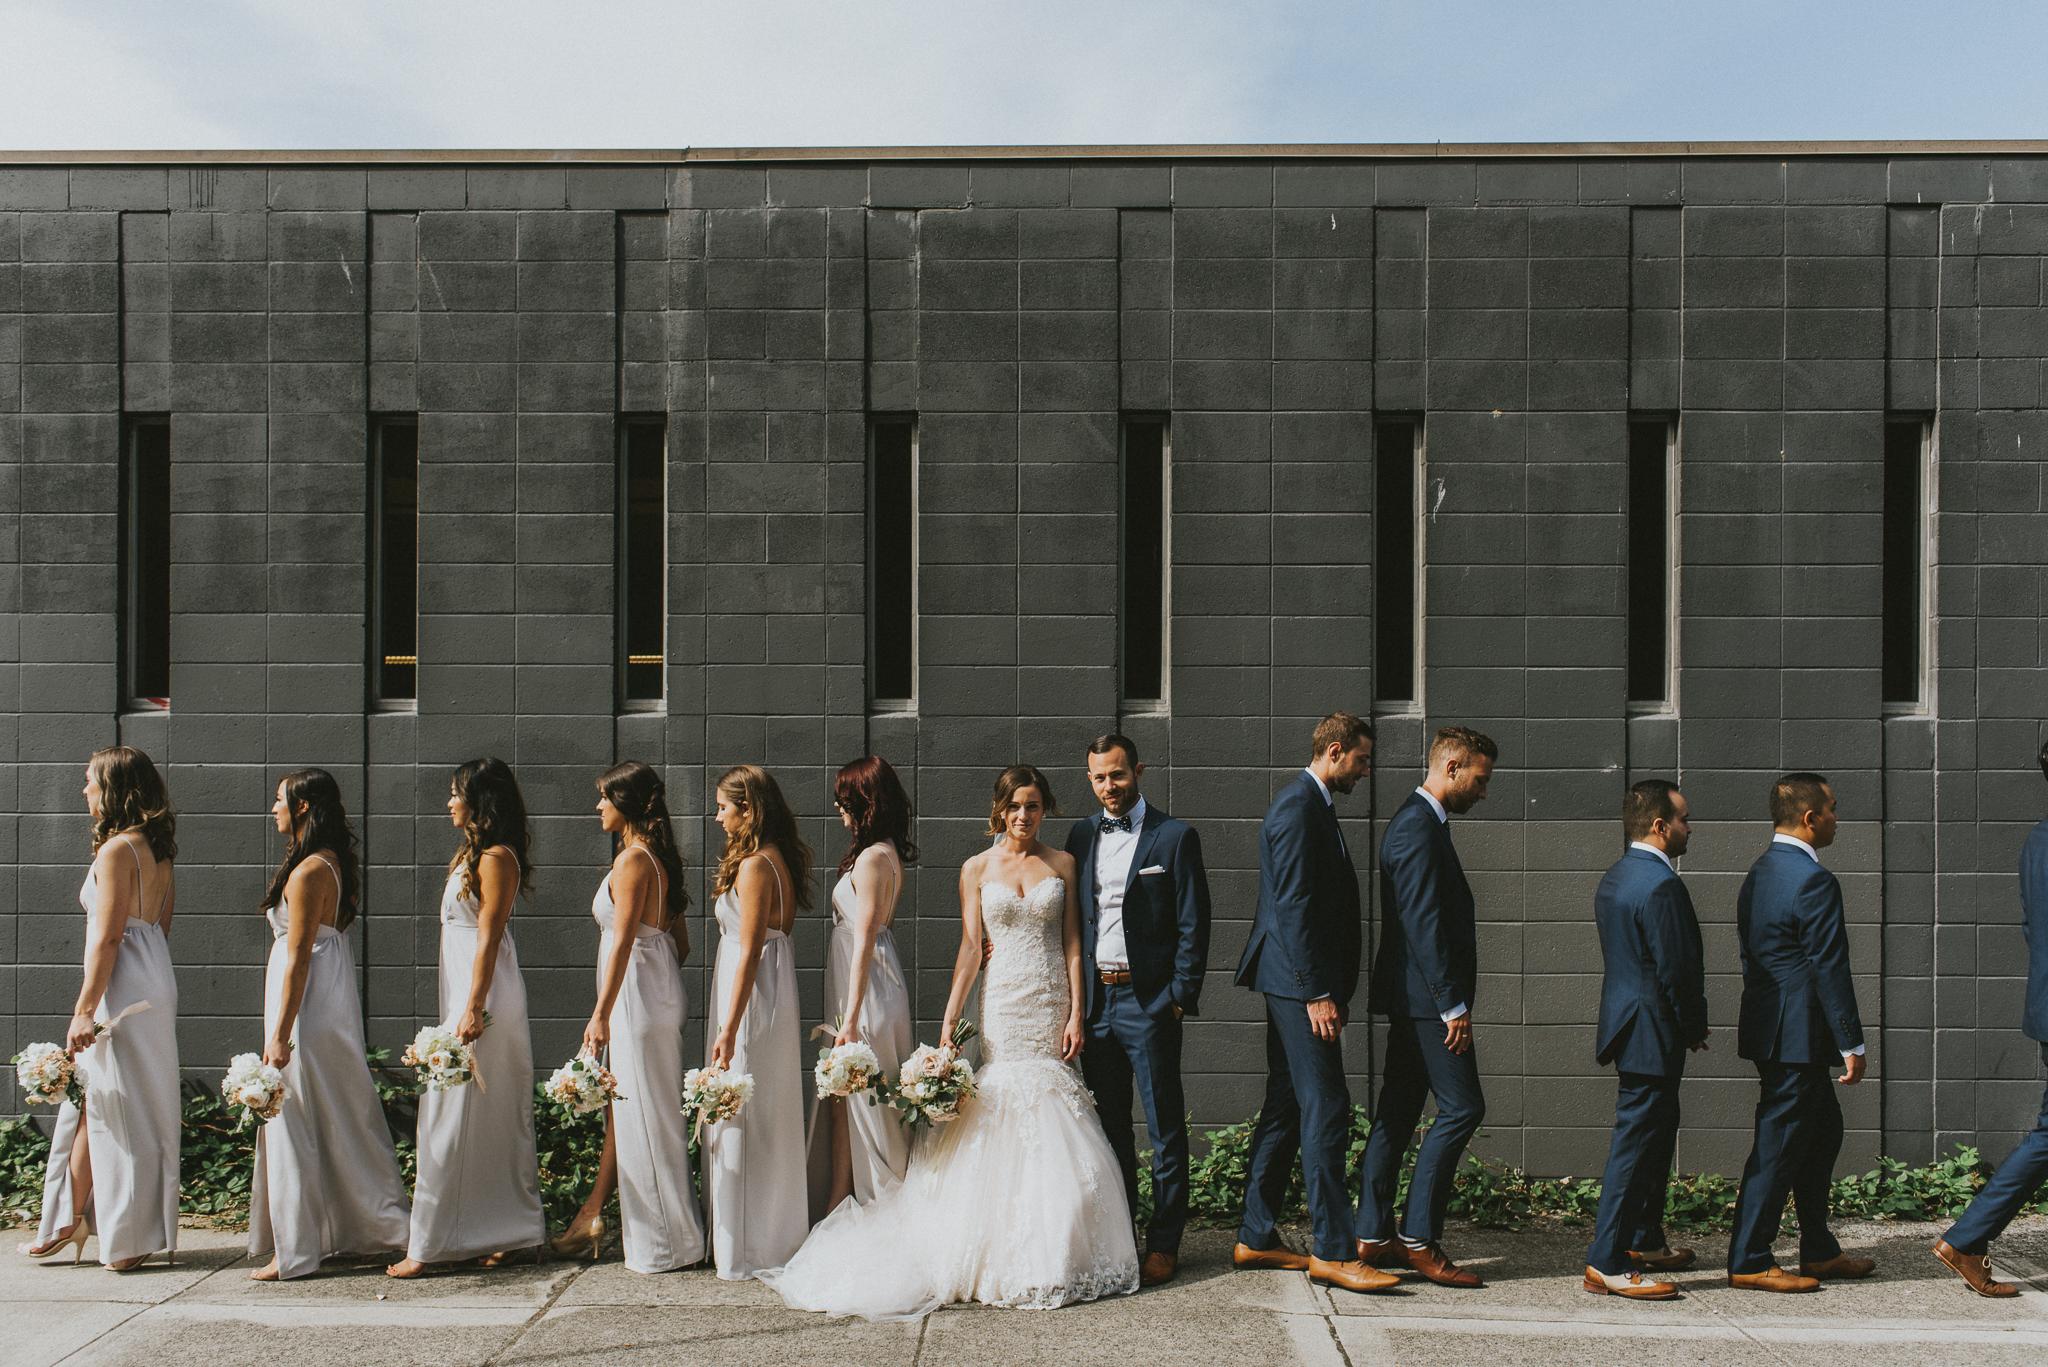 40-permanent-vancouver-wedding-courtneysteven-web-8227.jpg